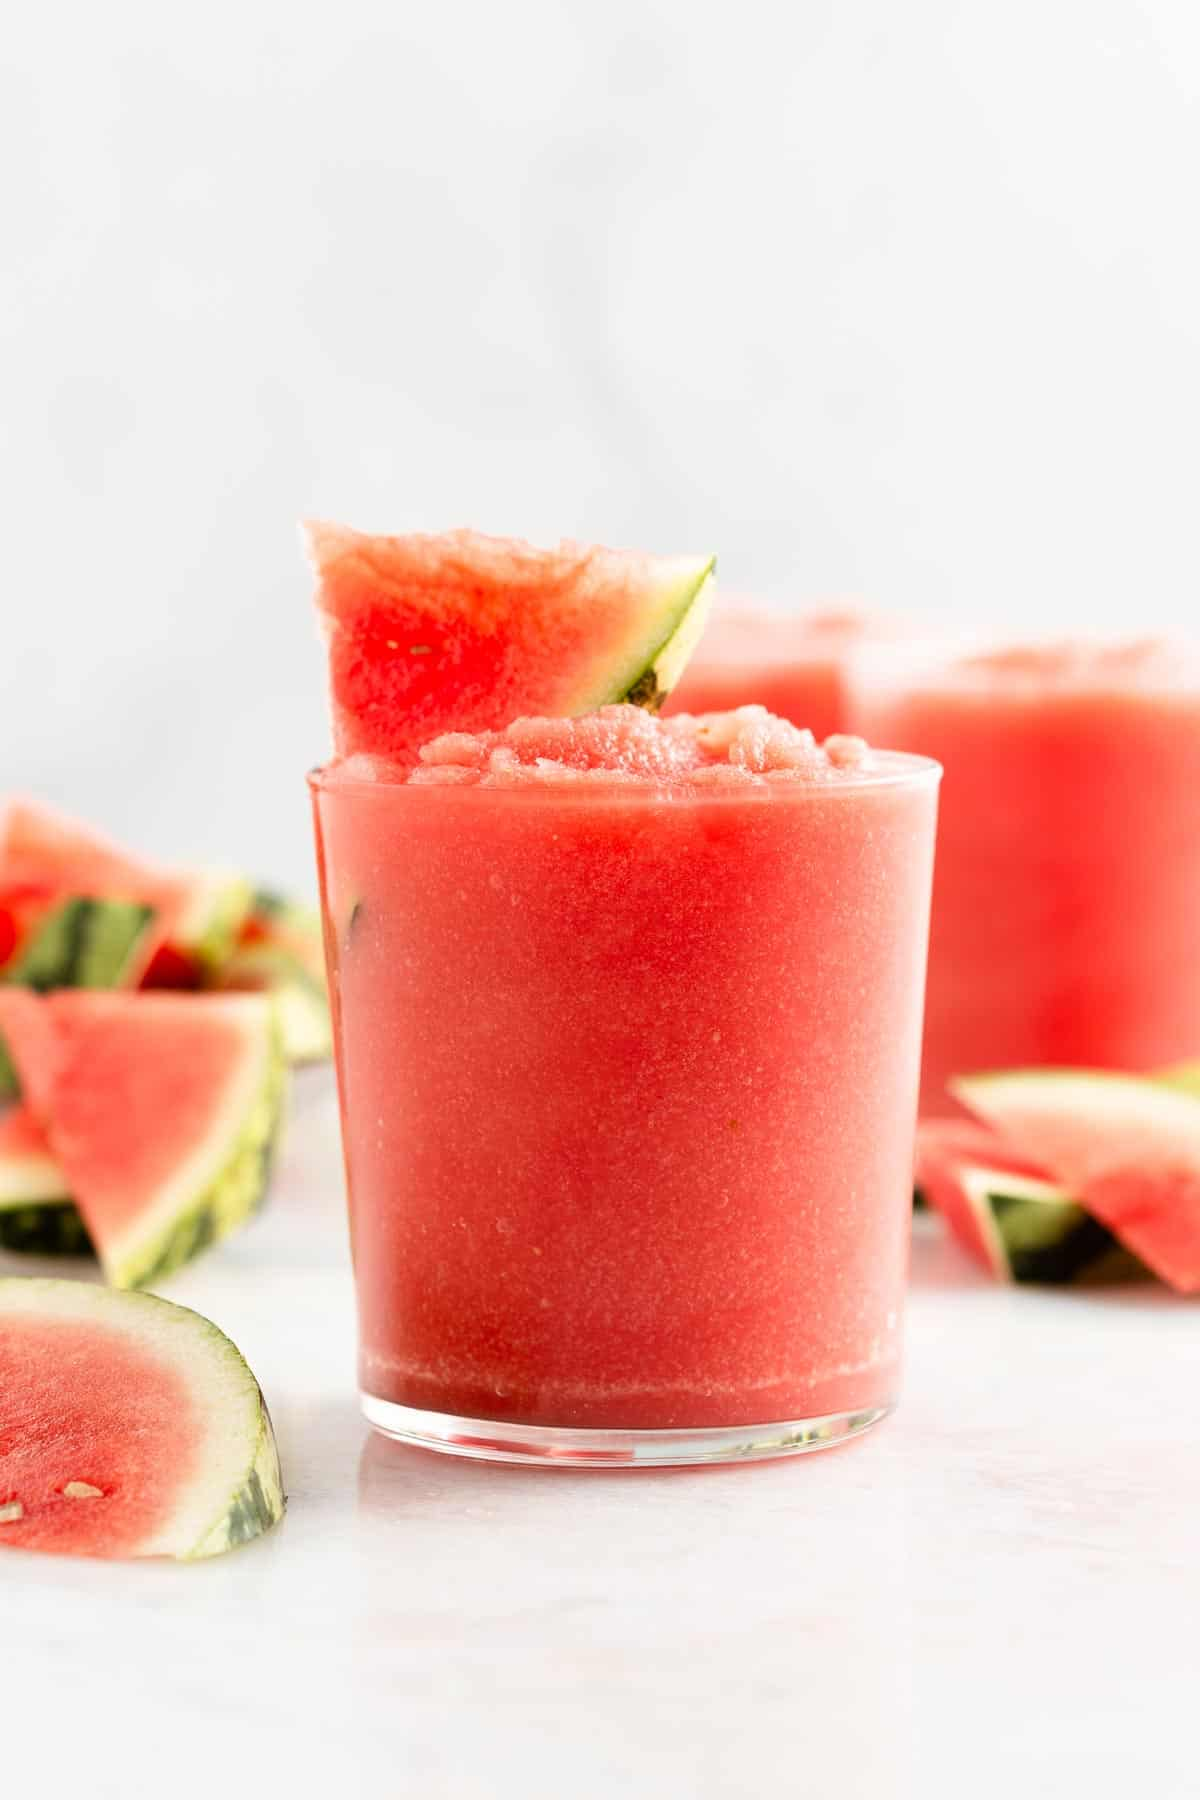 pink slushy drink garnished with a watermelon slice